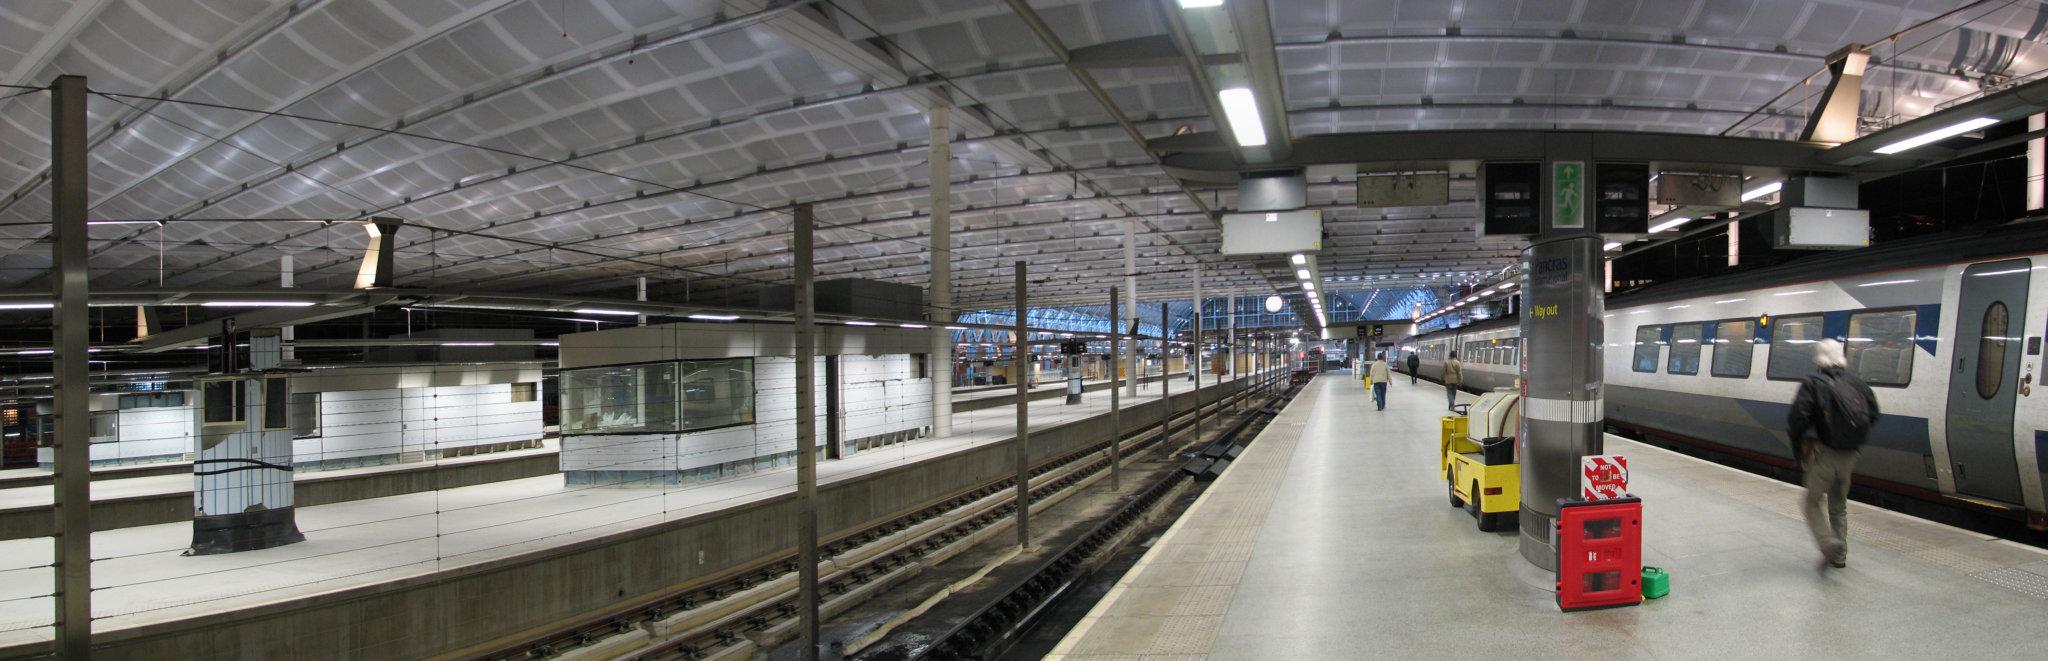 St Pancras Internation Station